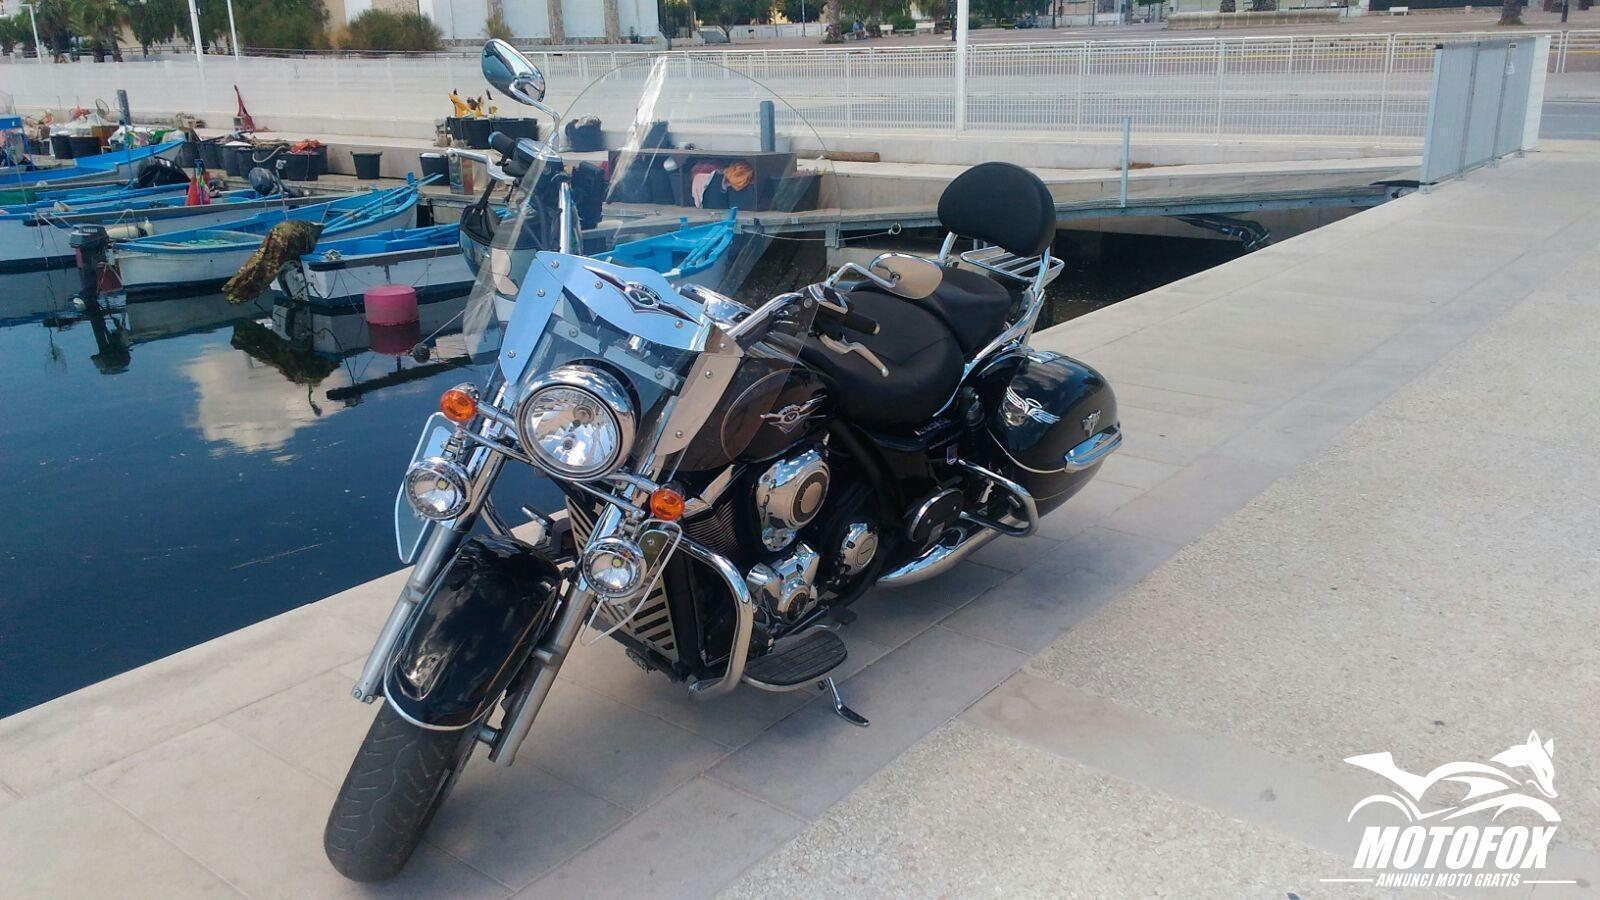 Kawasaki VN 1700 Classic tourer - MotoFox